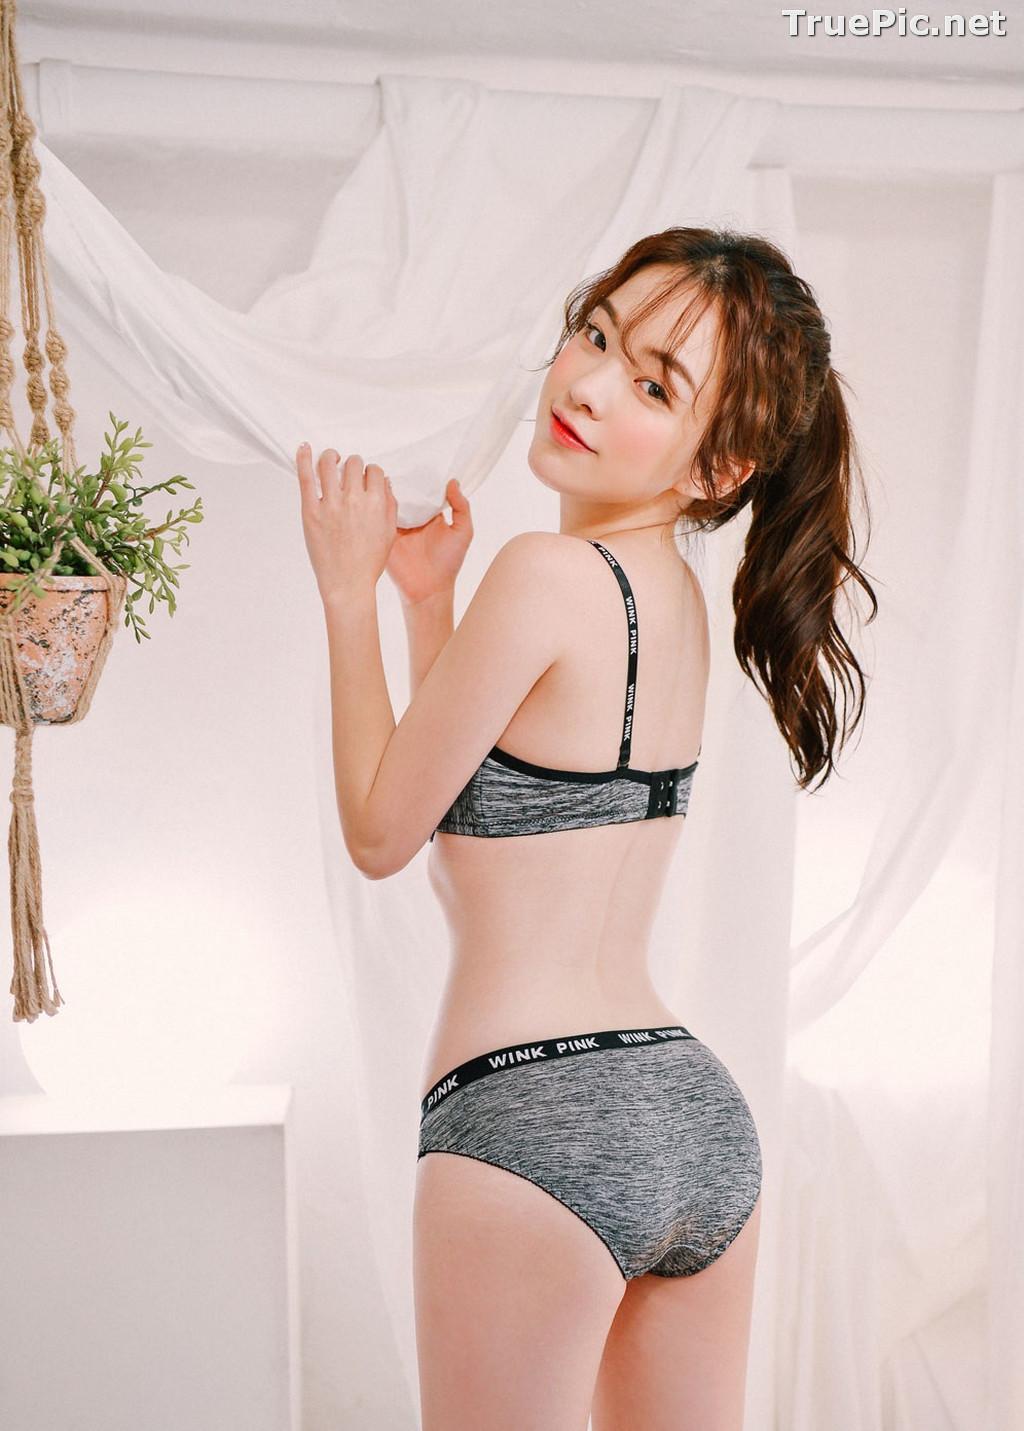 Image Korean Lingerie Queen – Haneul – Comfy in Cotton Lingerie - TruePic.net - Picture-4